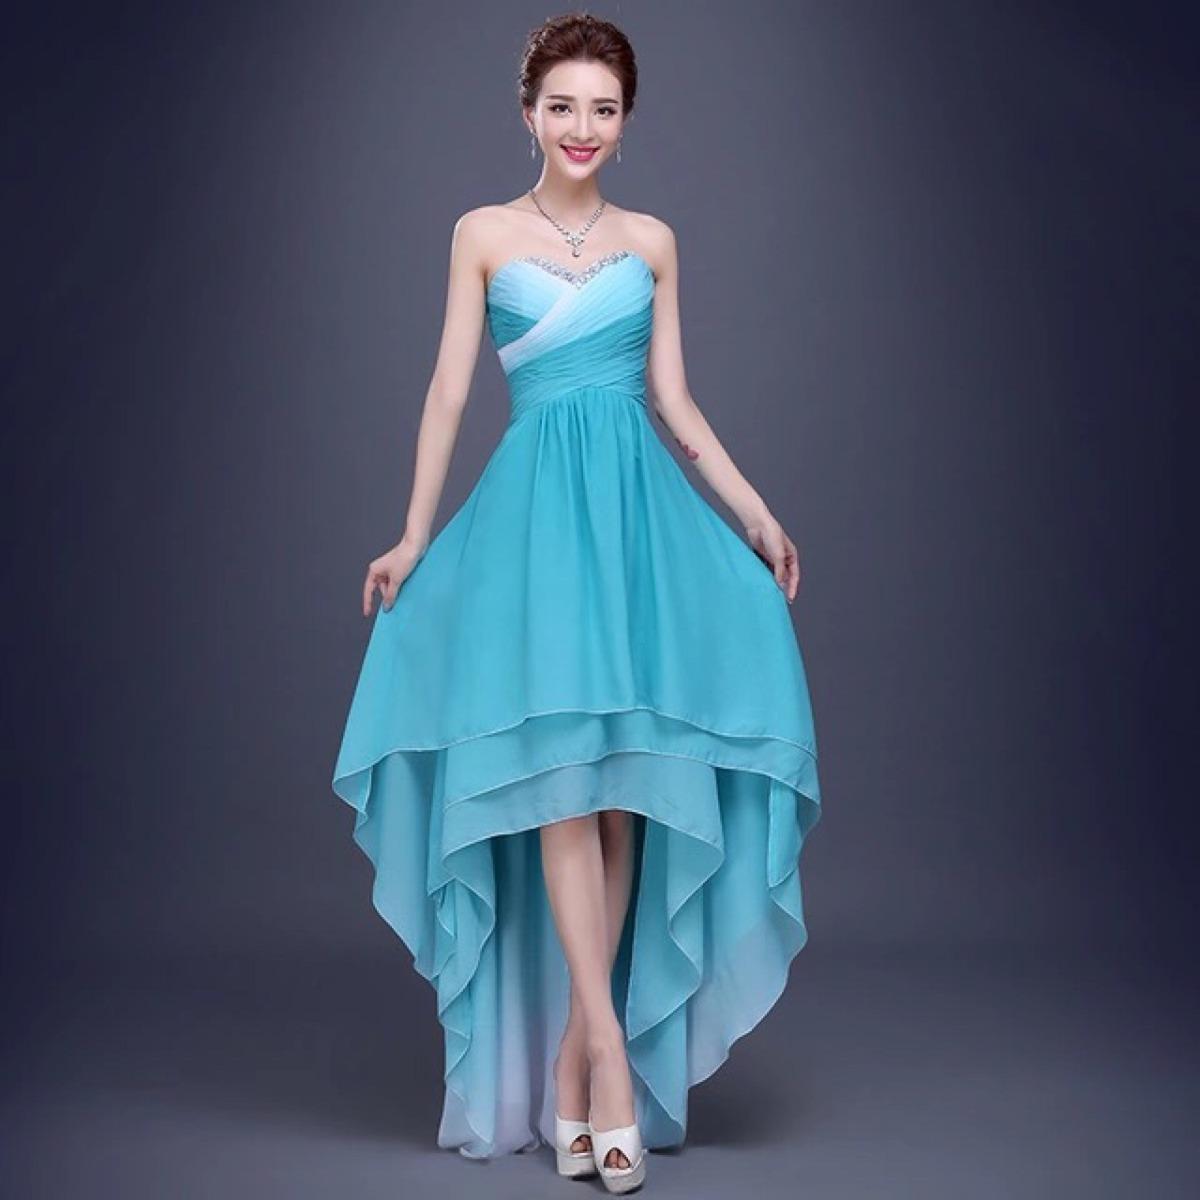 Imagenes vestidos para fiesta de matrimonio